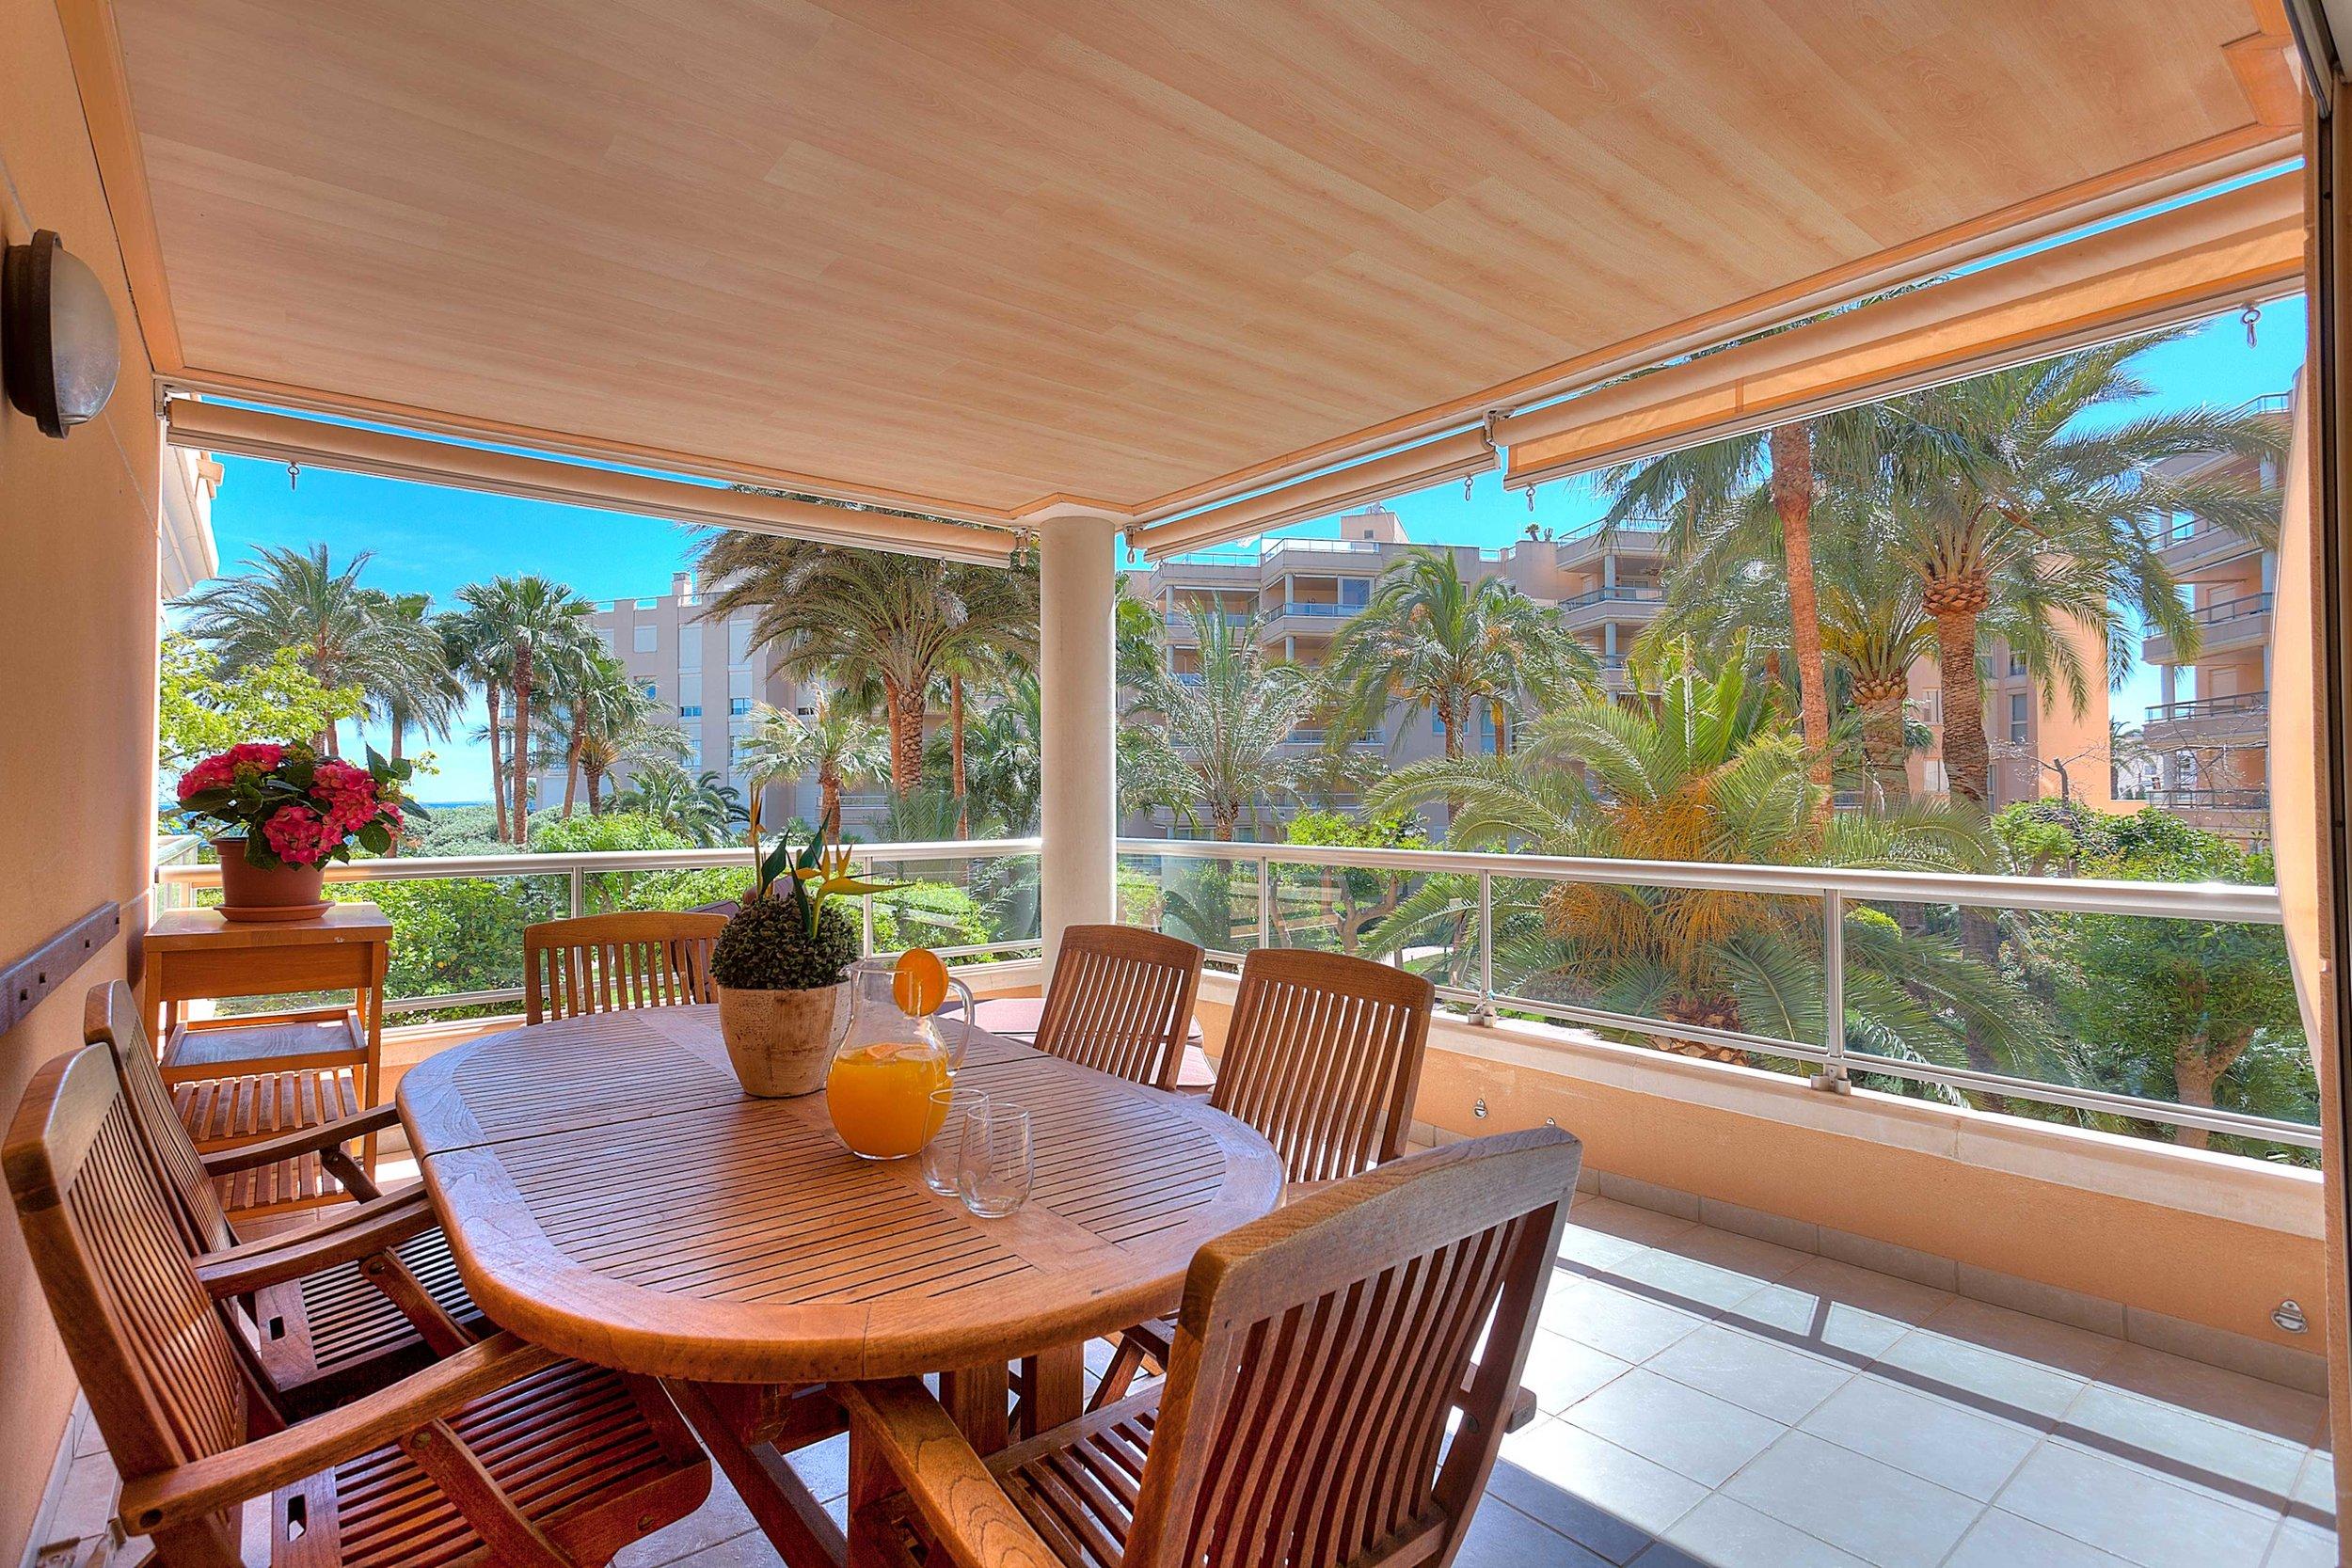 Bossa Beach 4-PB-1 - 4 bedroom, 2 bathroom Playa d'en Bossa apartment with partial sea views